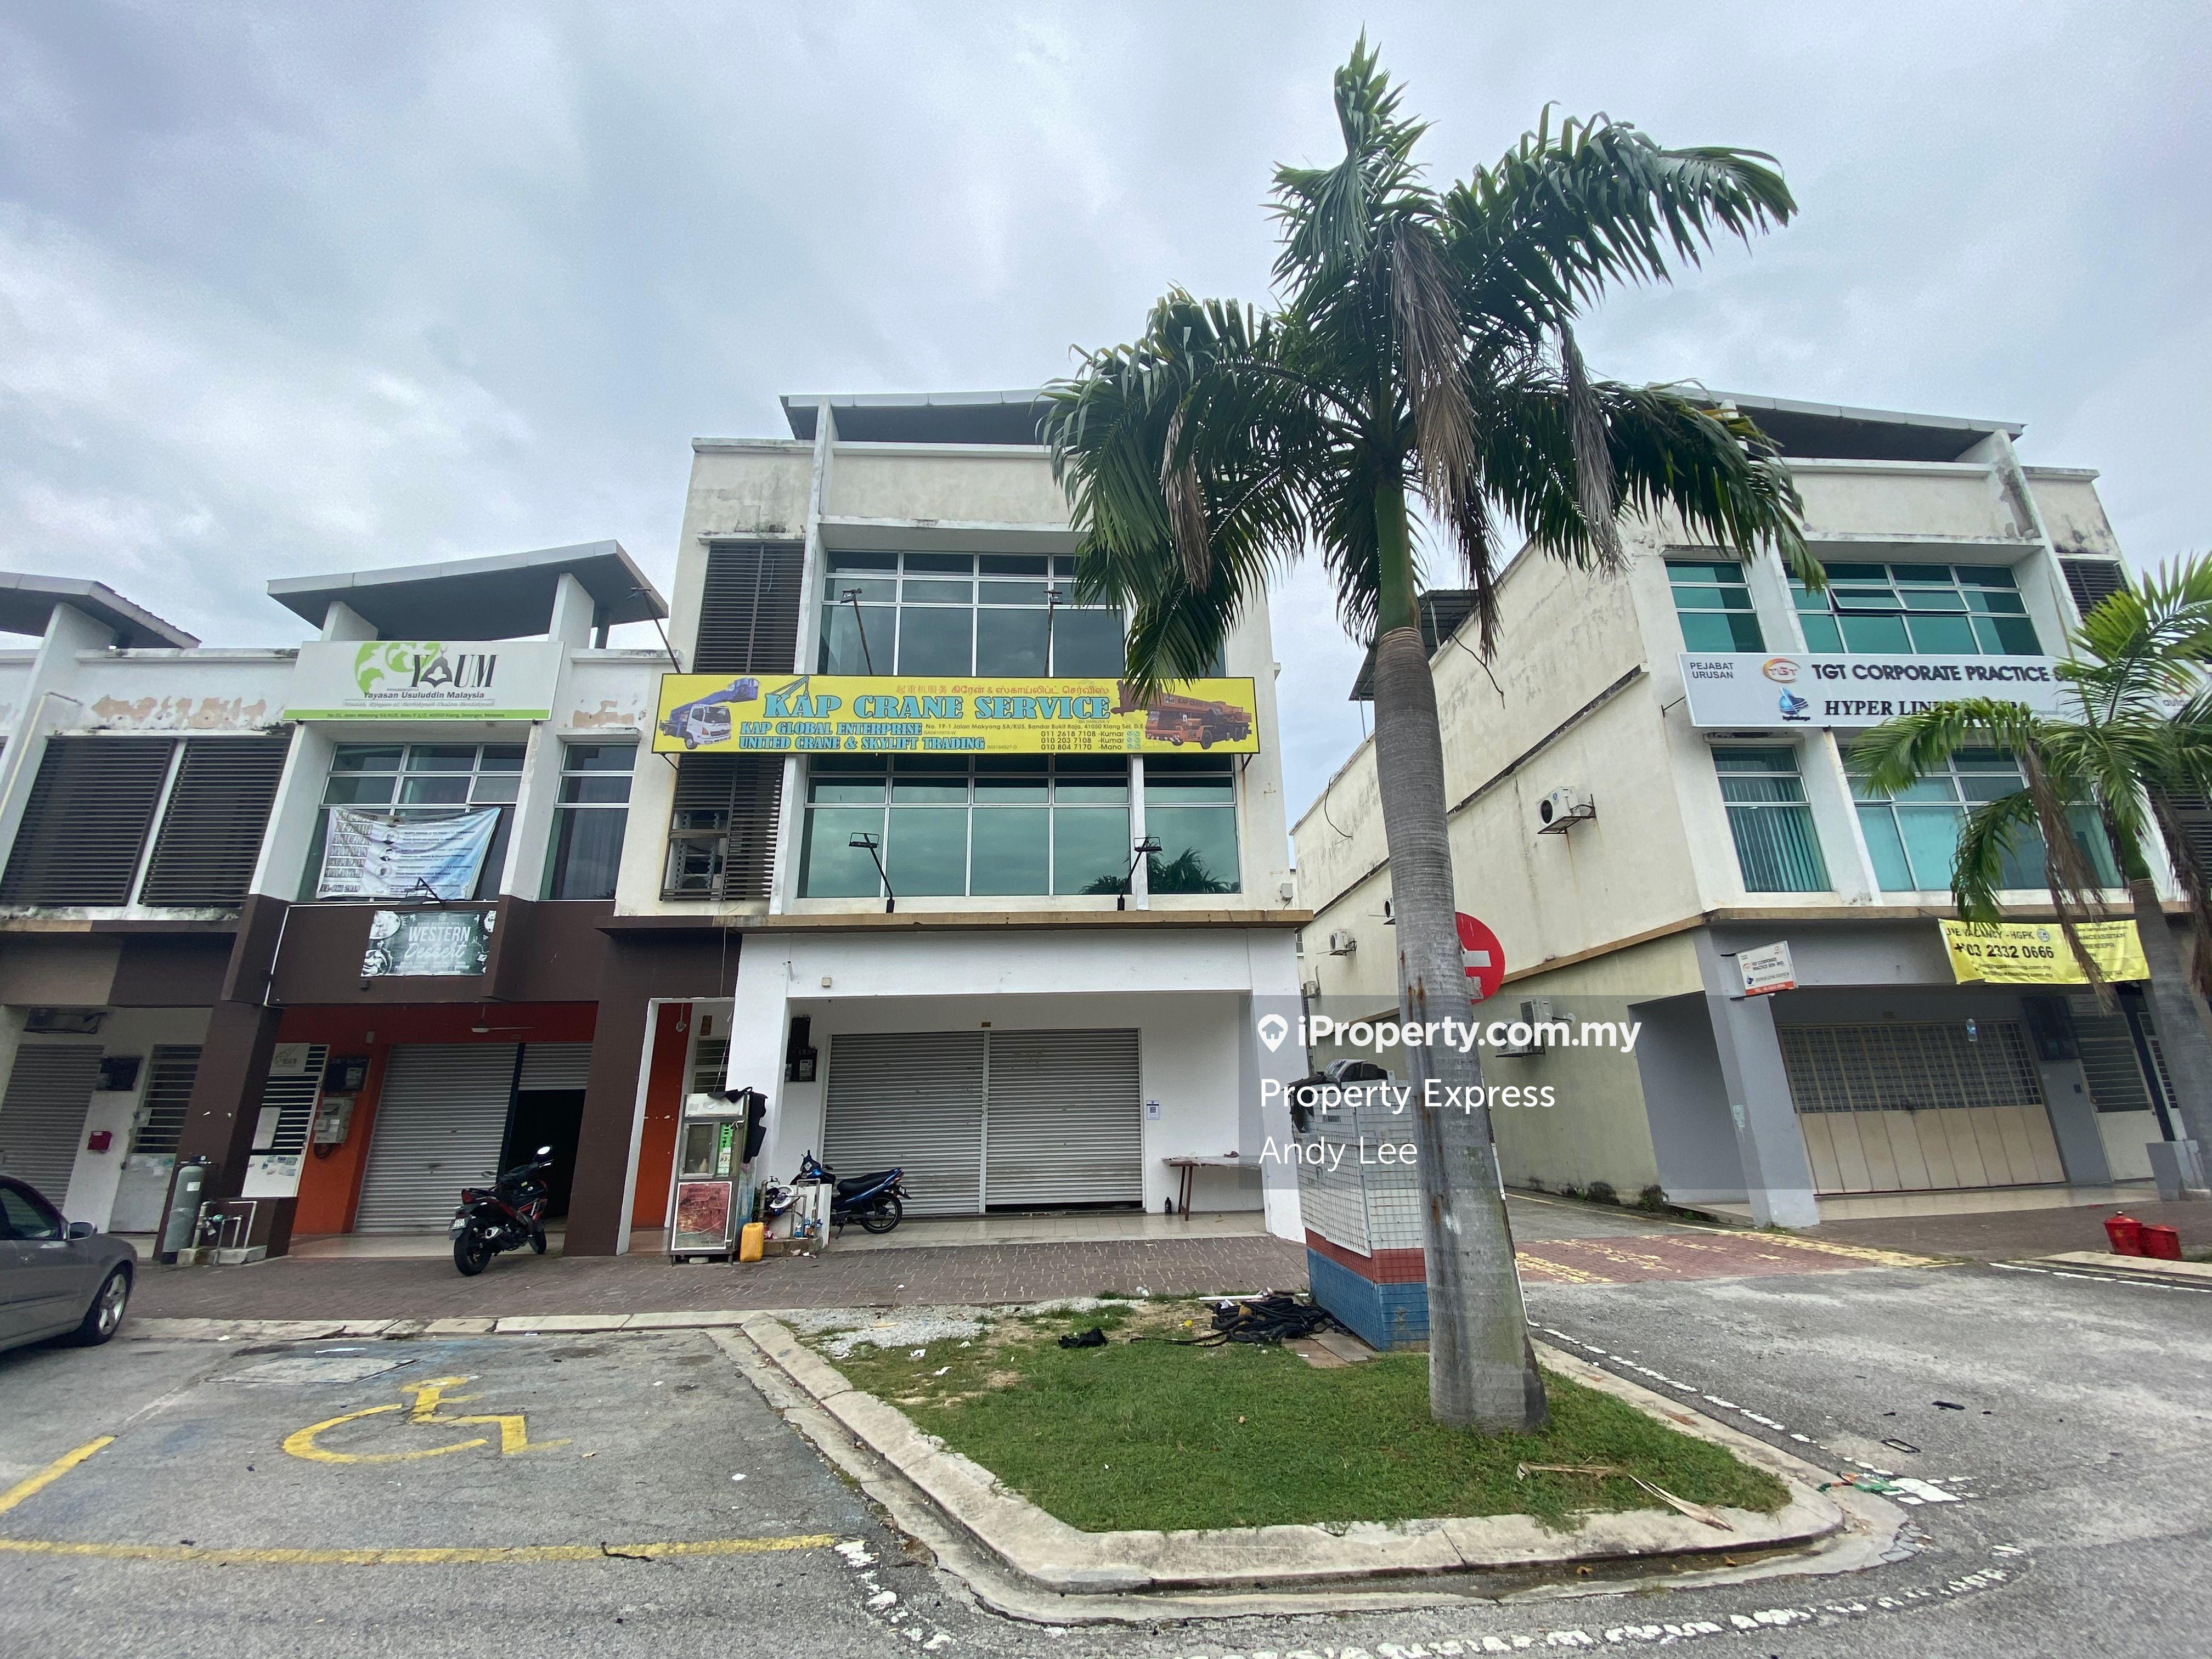 Taipan Setia Alam Eleven Avenue Three Avenue Gateway 16 Klang Sentral Bandar Baru Klang, Klang Setia Alam Shah Alam Seksyen 7 Ardence Crest, Bandar Bukit Raja